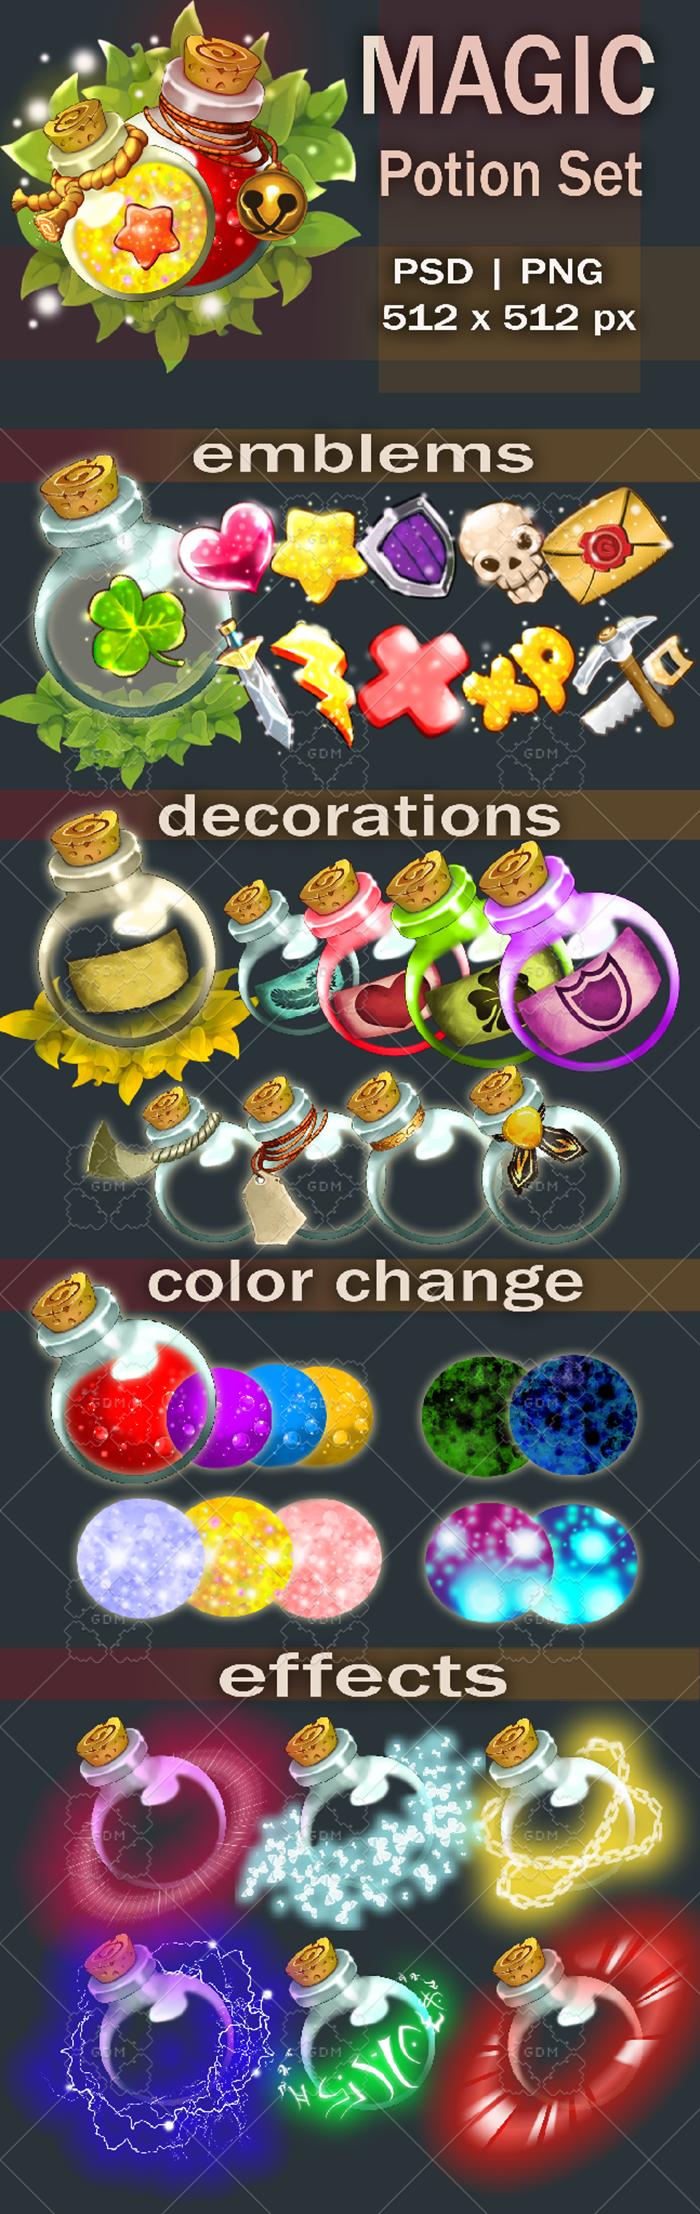 Magic potion set